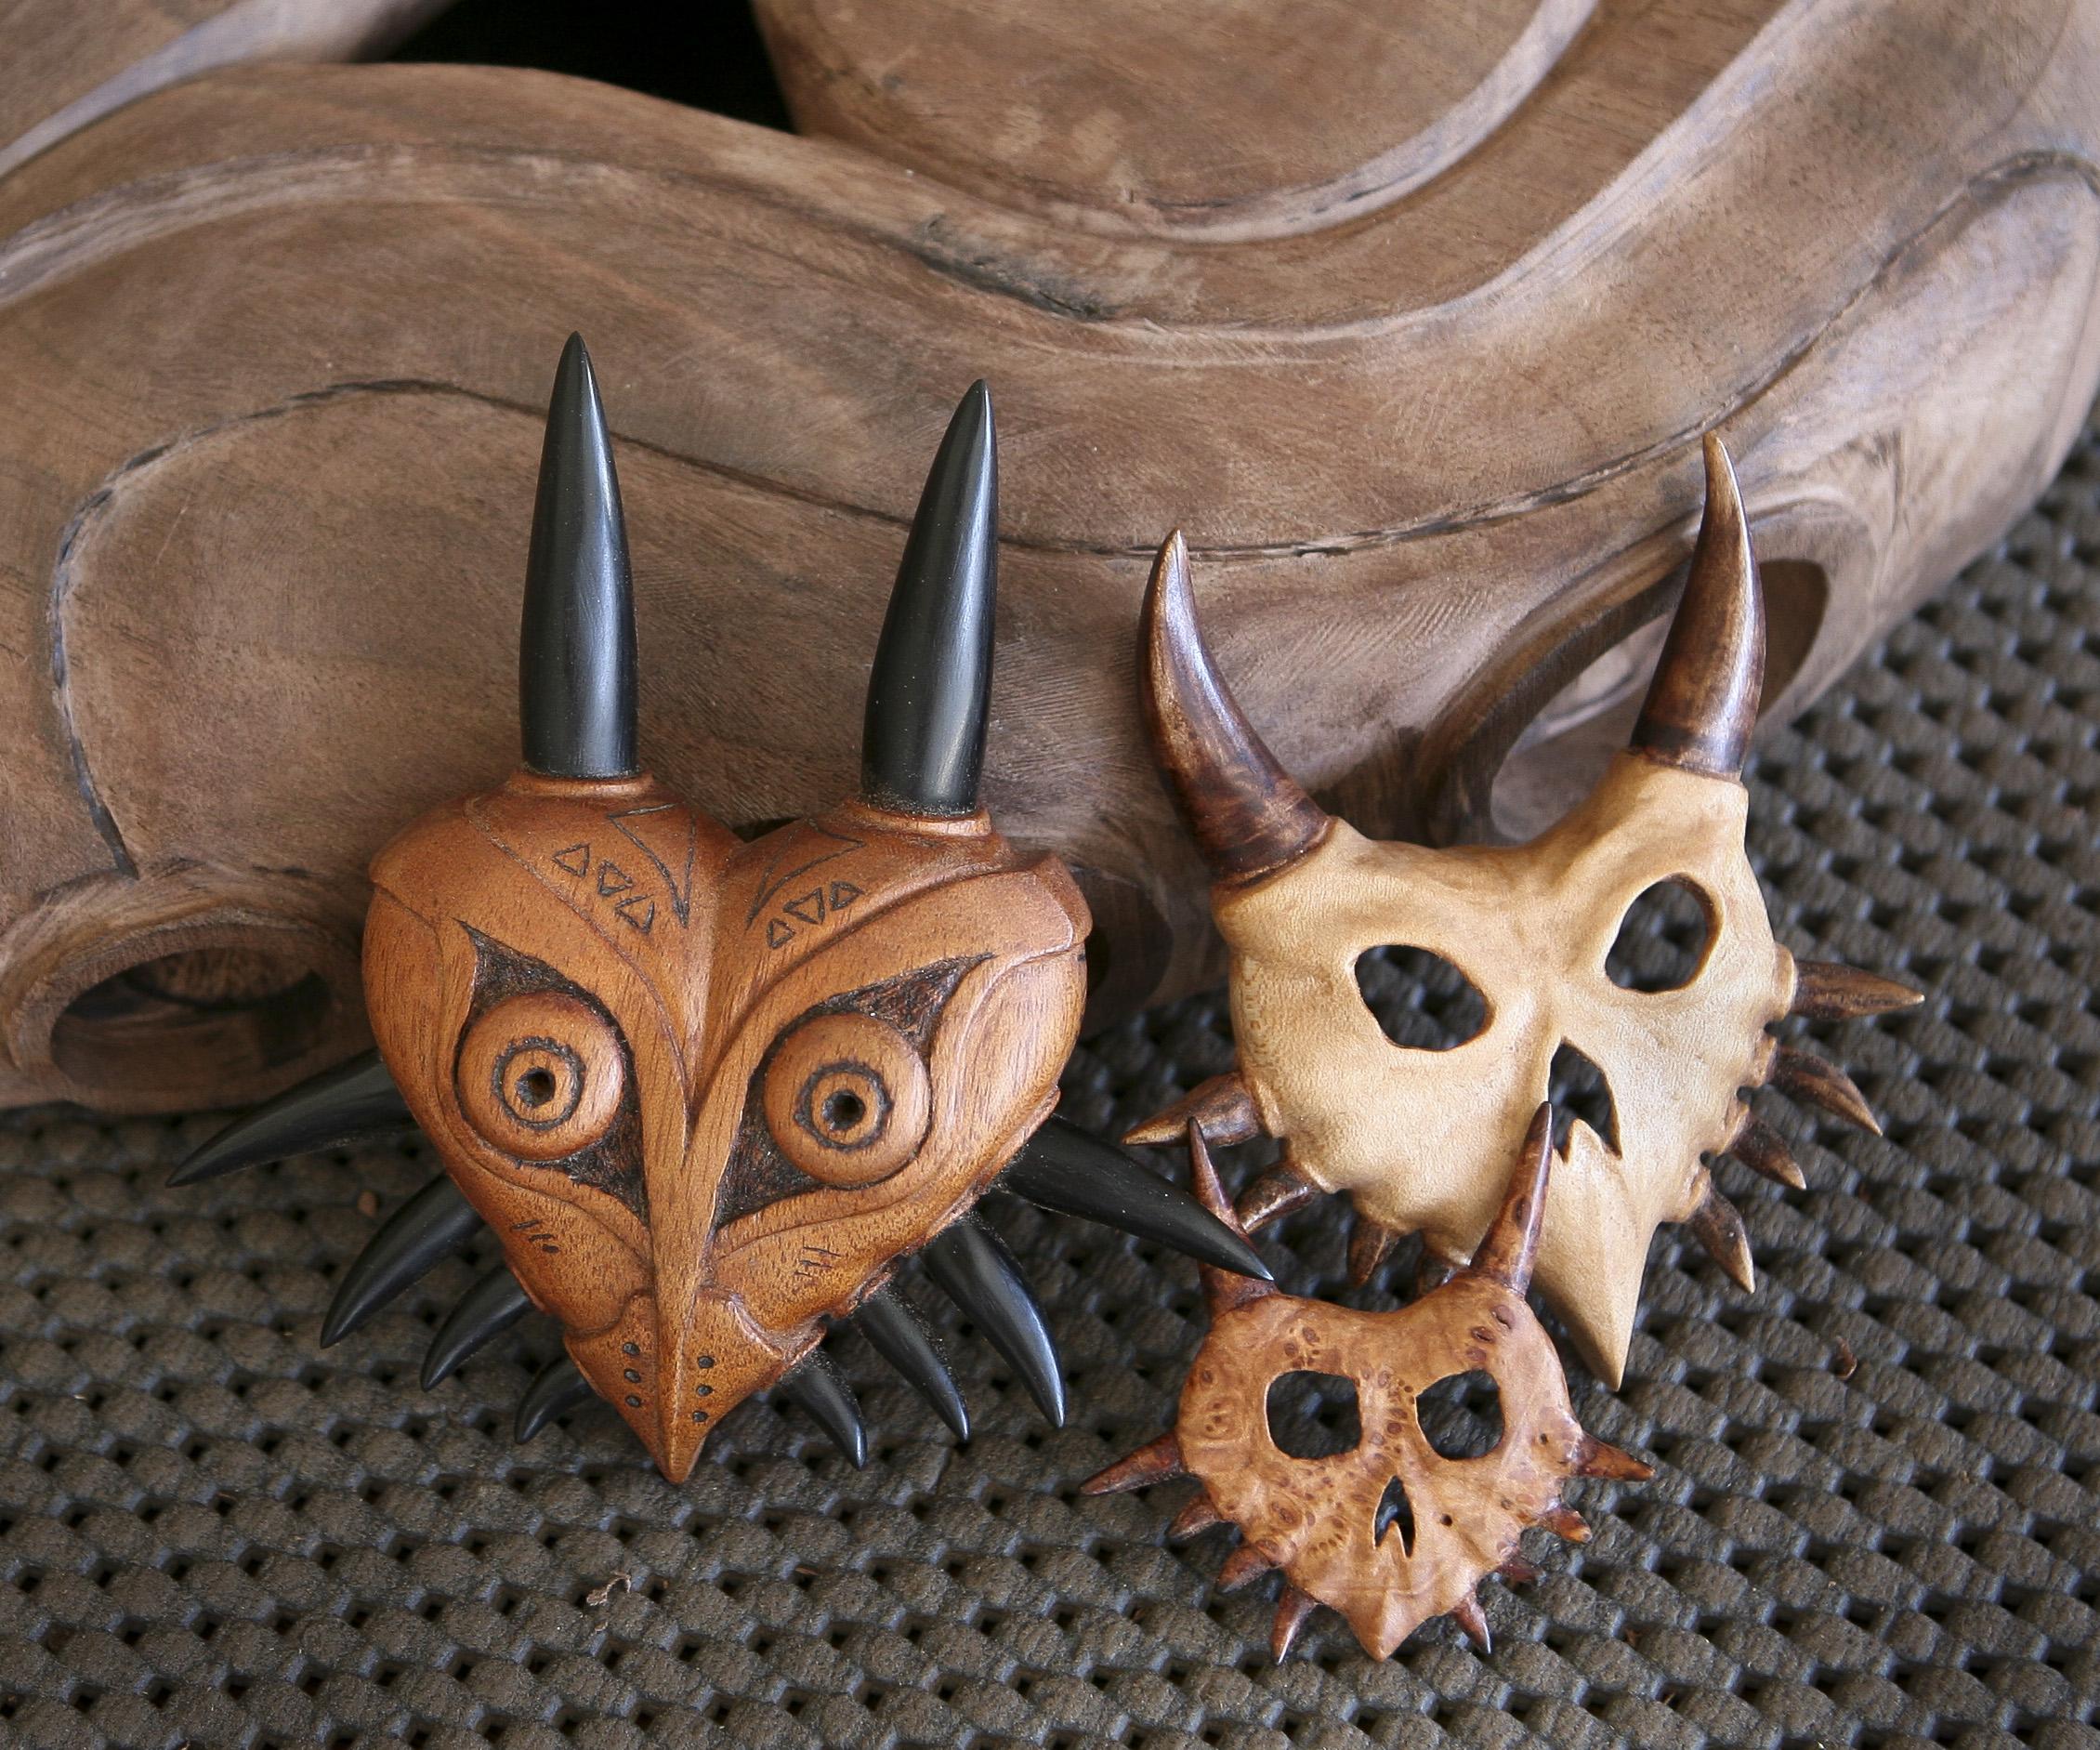 4 Majora's Mask